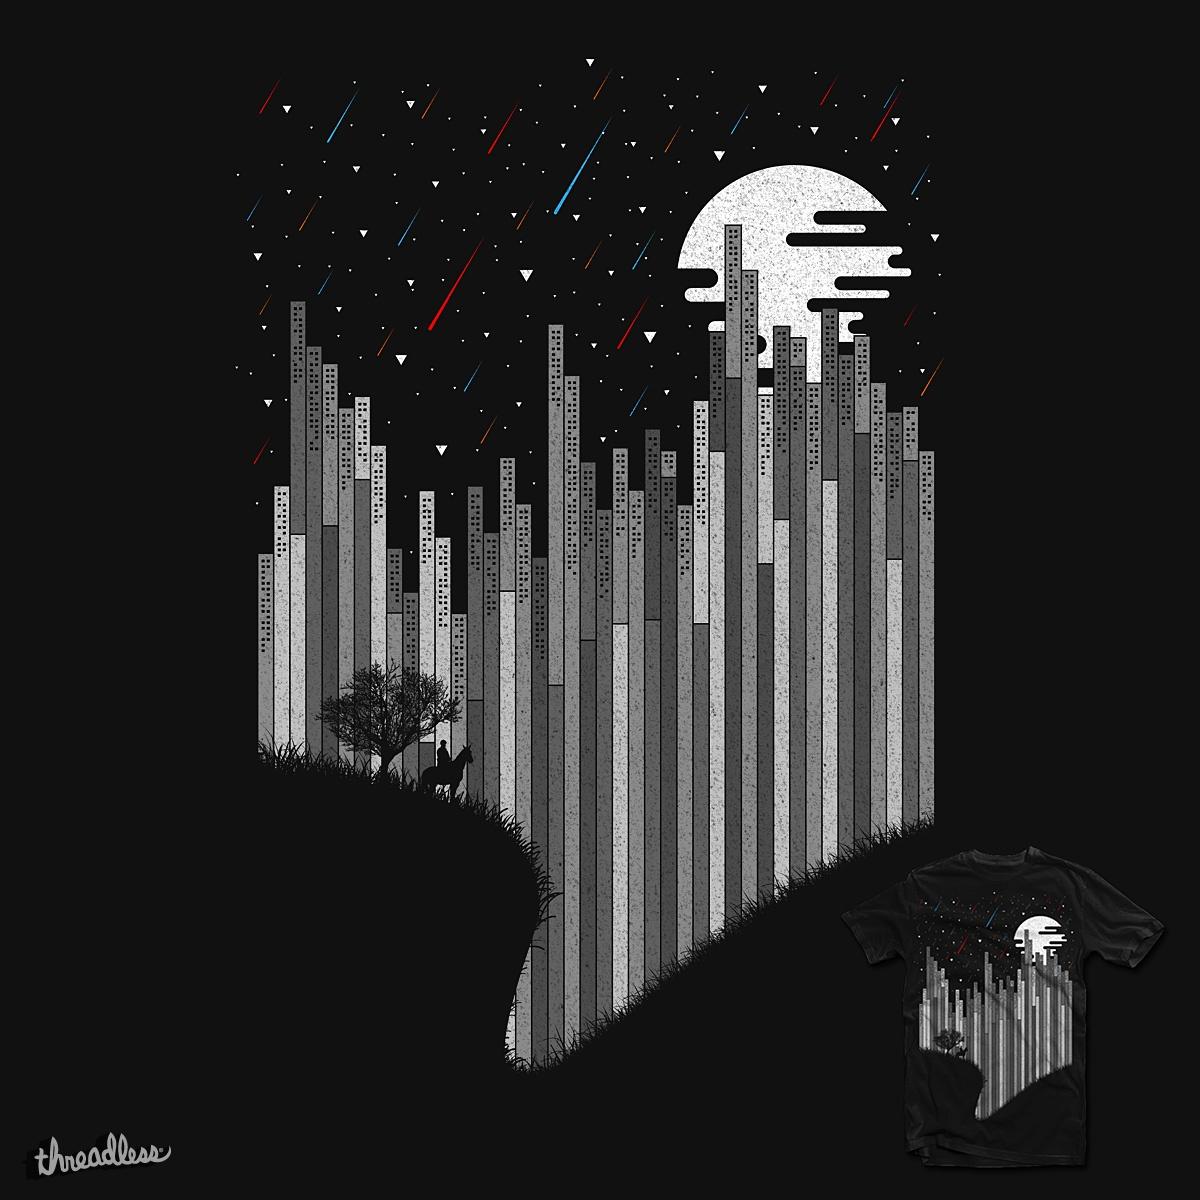 A Thousand Wishes Fall Upon Geometropolis by rizkisyahril on Threadless